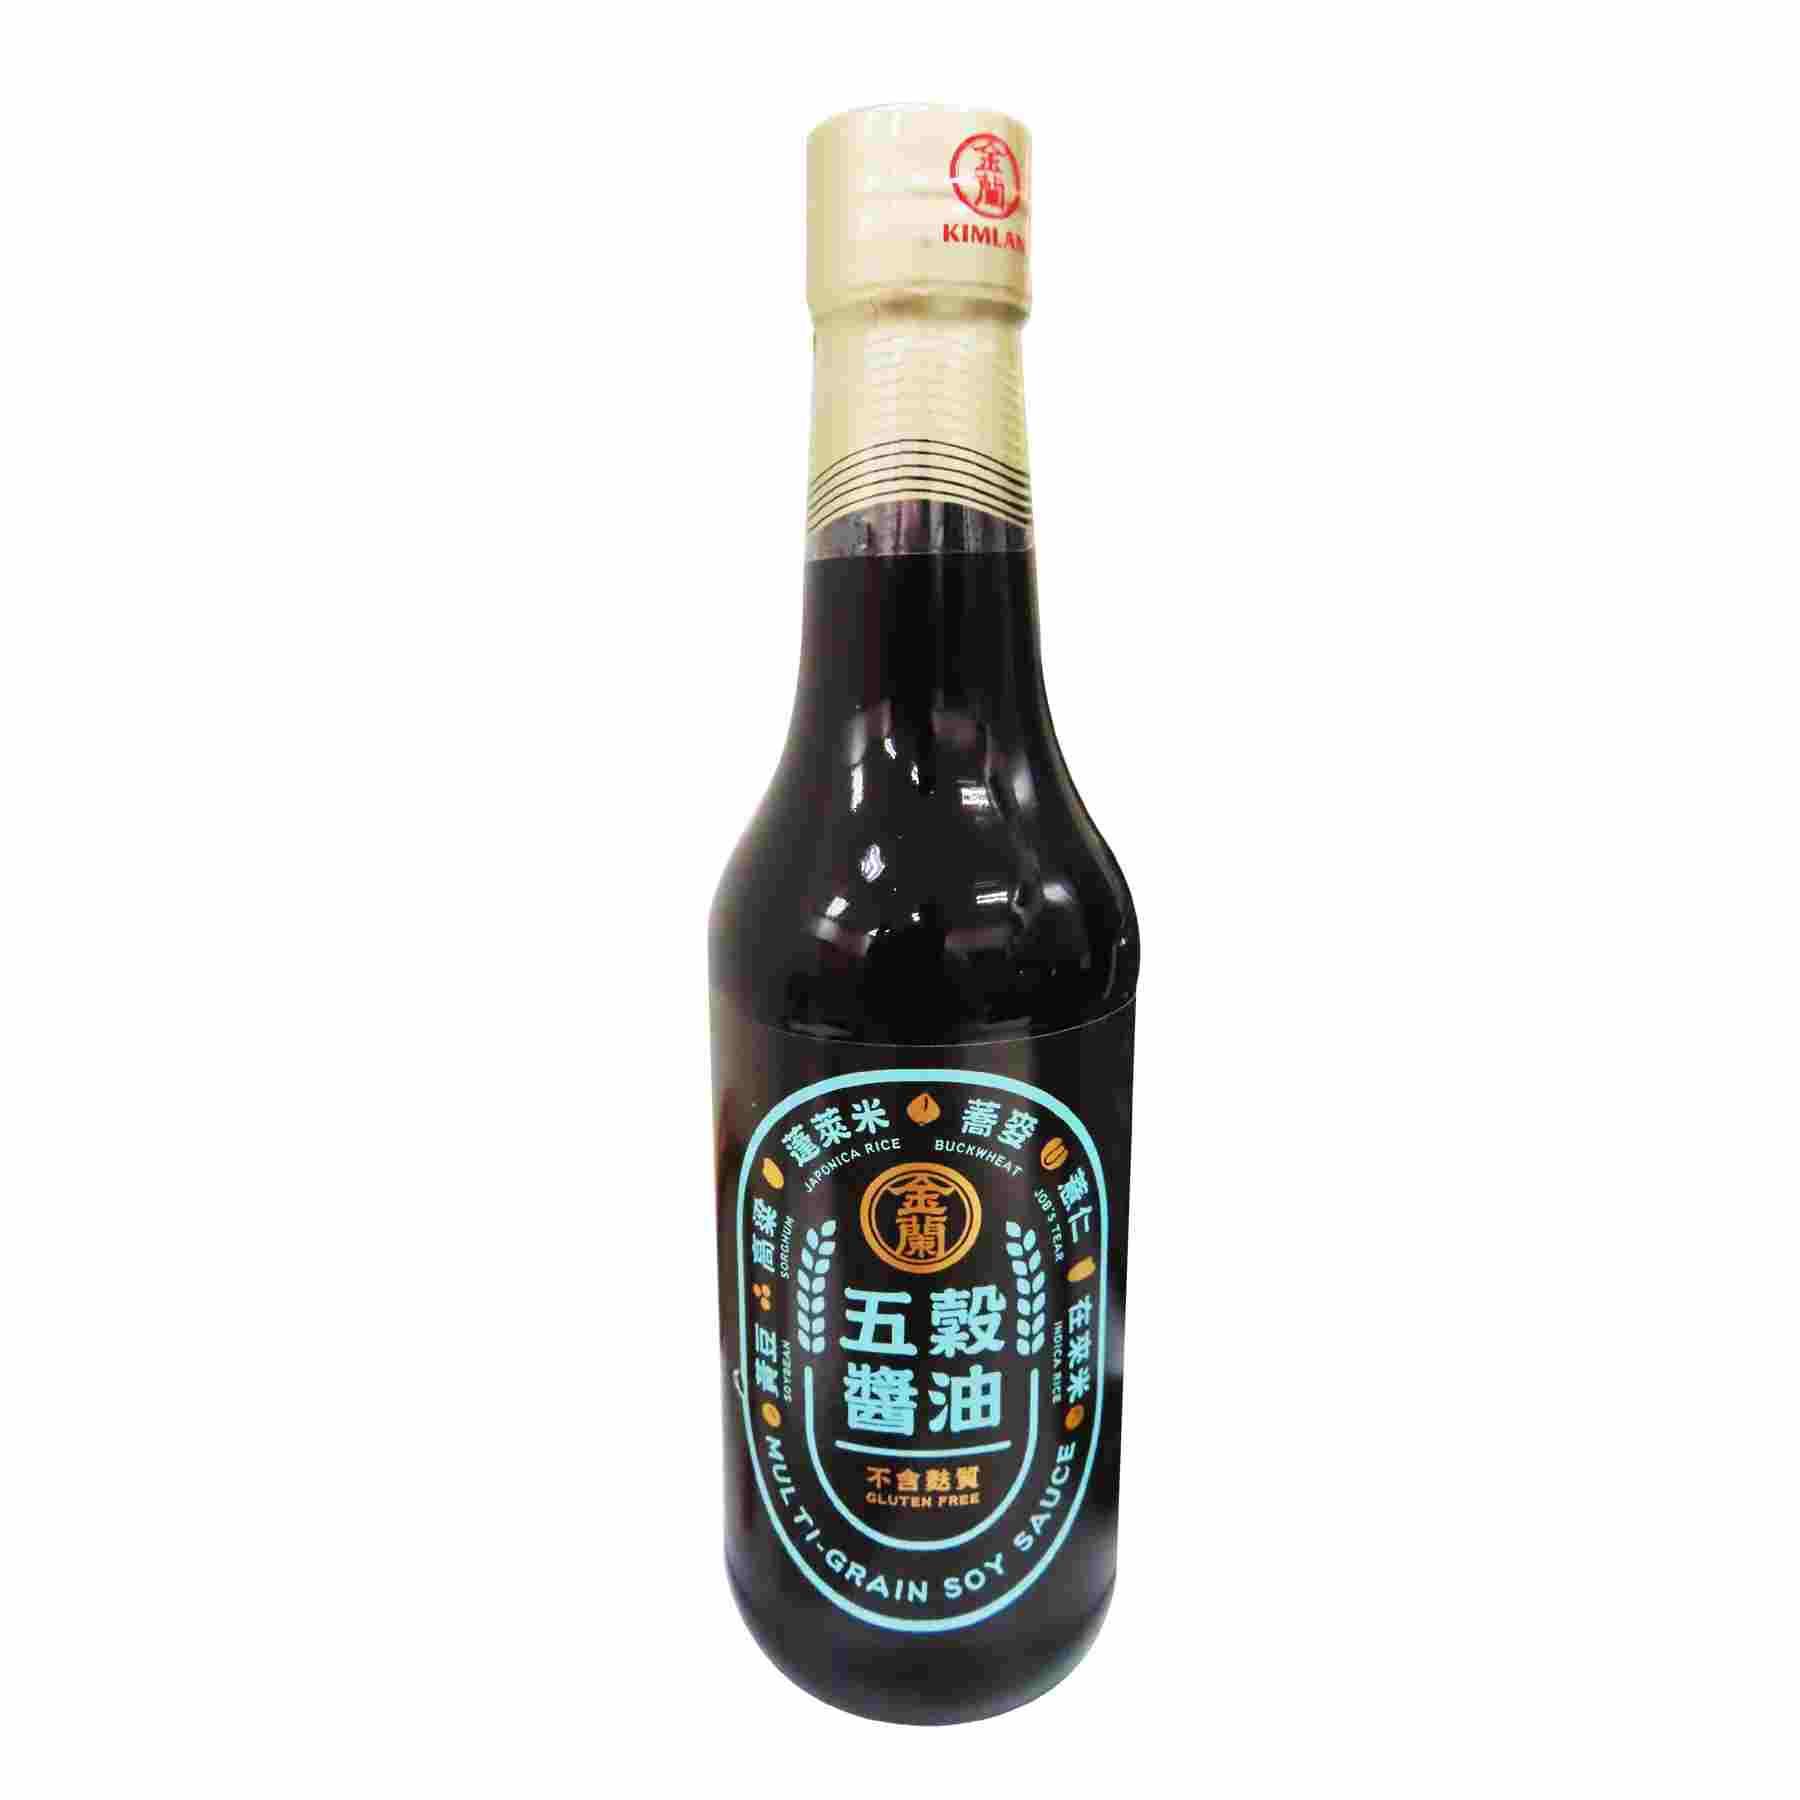 Image Multi-grain Soy Sauce 金兰 - 五谷醬油 500 grams